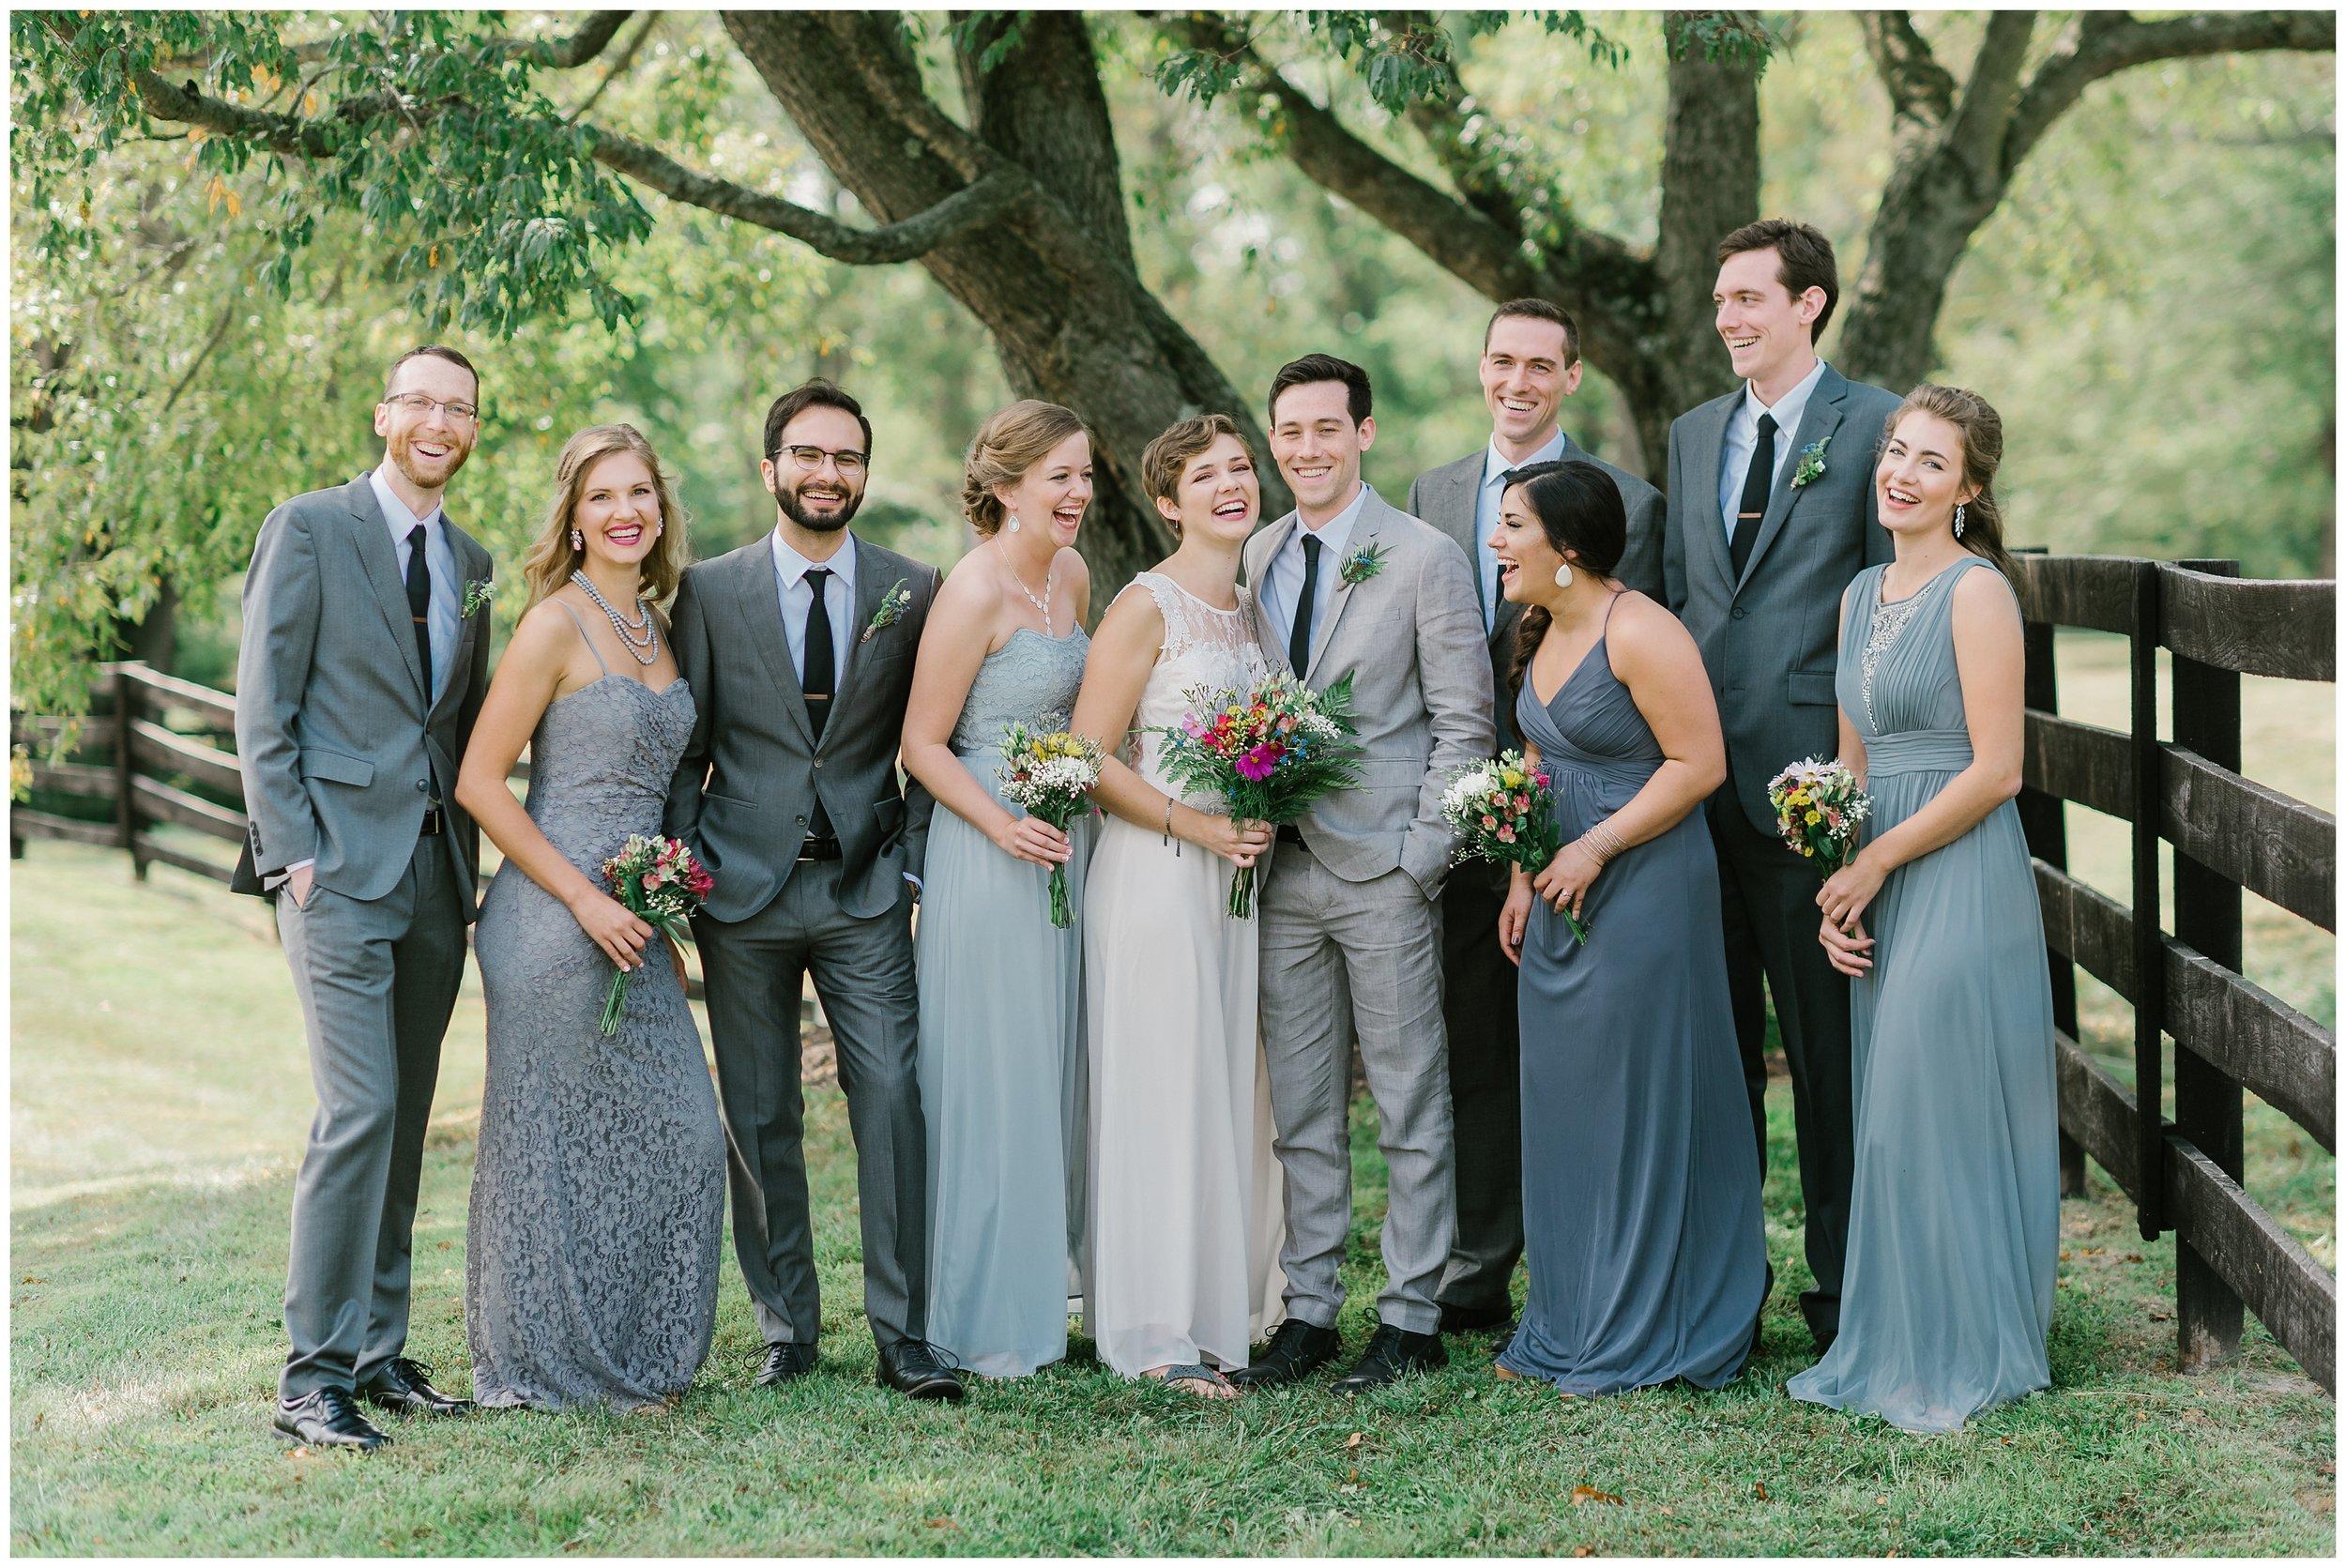 Rebecca_Shehorn_Photography_Indianapolis_Wedding_Photographer_7243.jpg